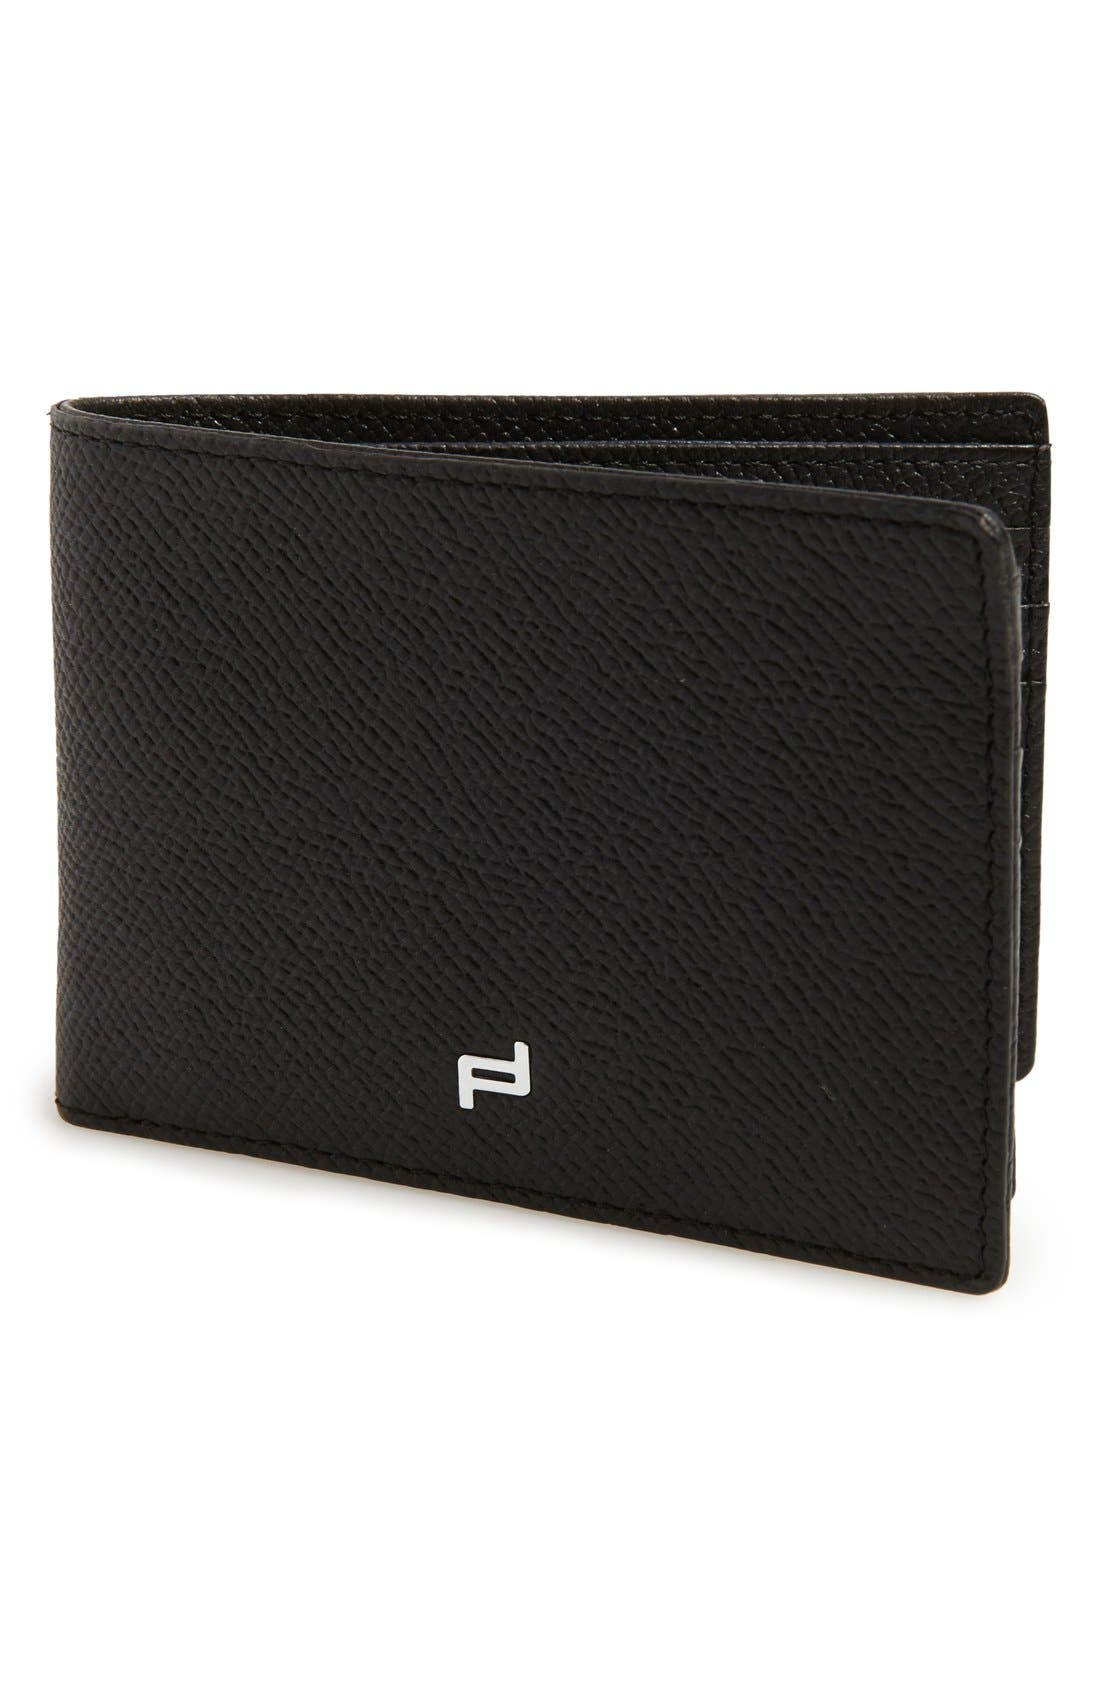 'FC 3.0' Leather L-Fold Wallet,                             Main thumbnail 1, color,                             Black